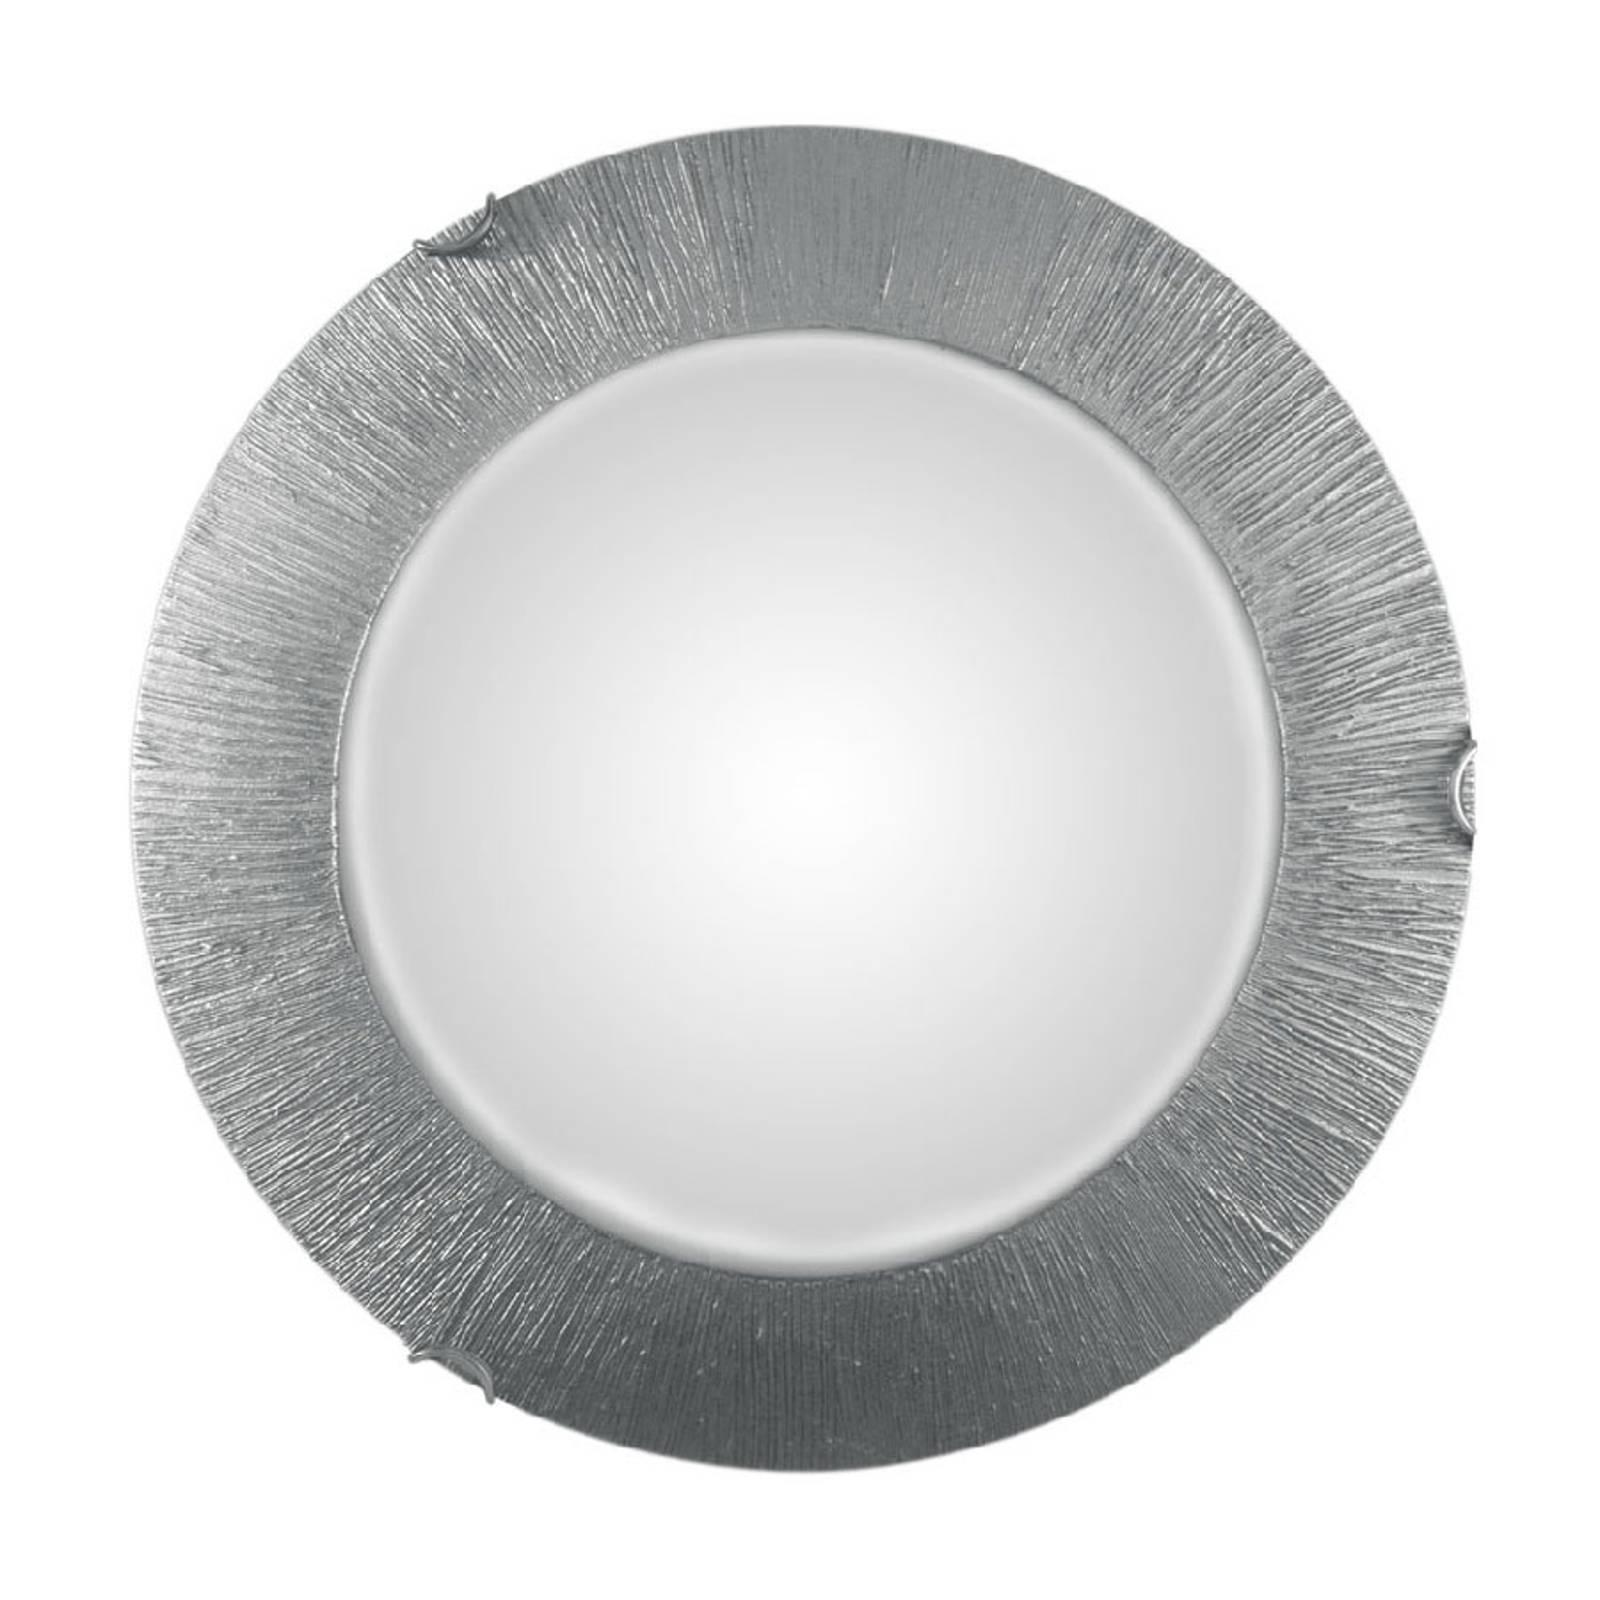 Wandlamp Moon Sun, zilver, Ø 40 cm